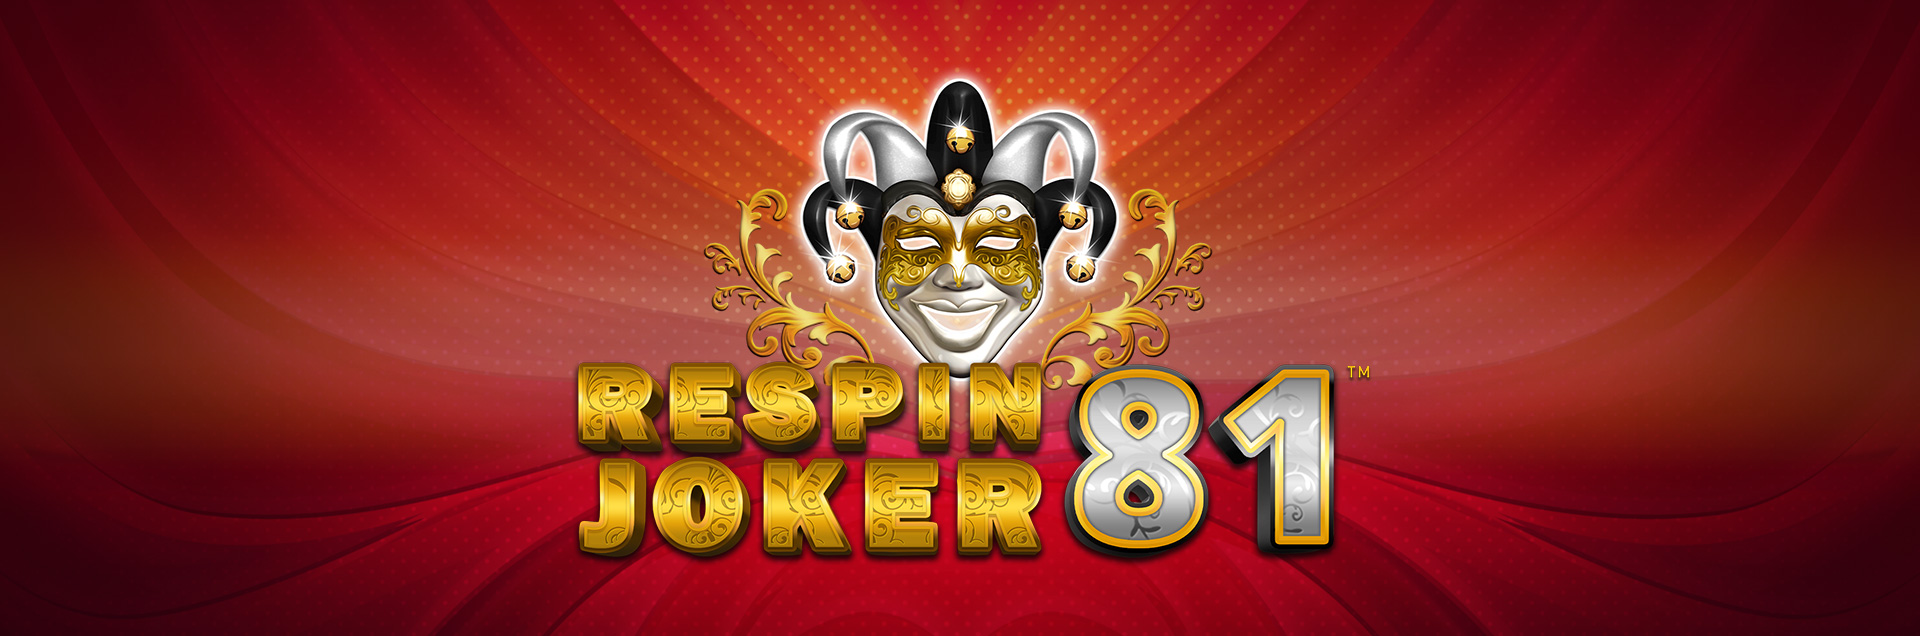 Respin Joker 81 header games